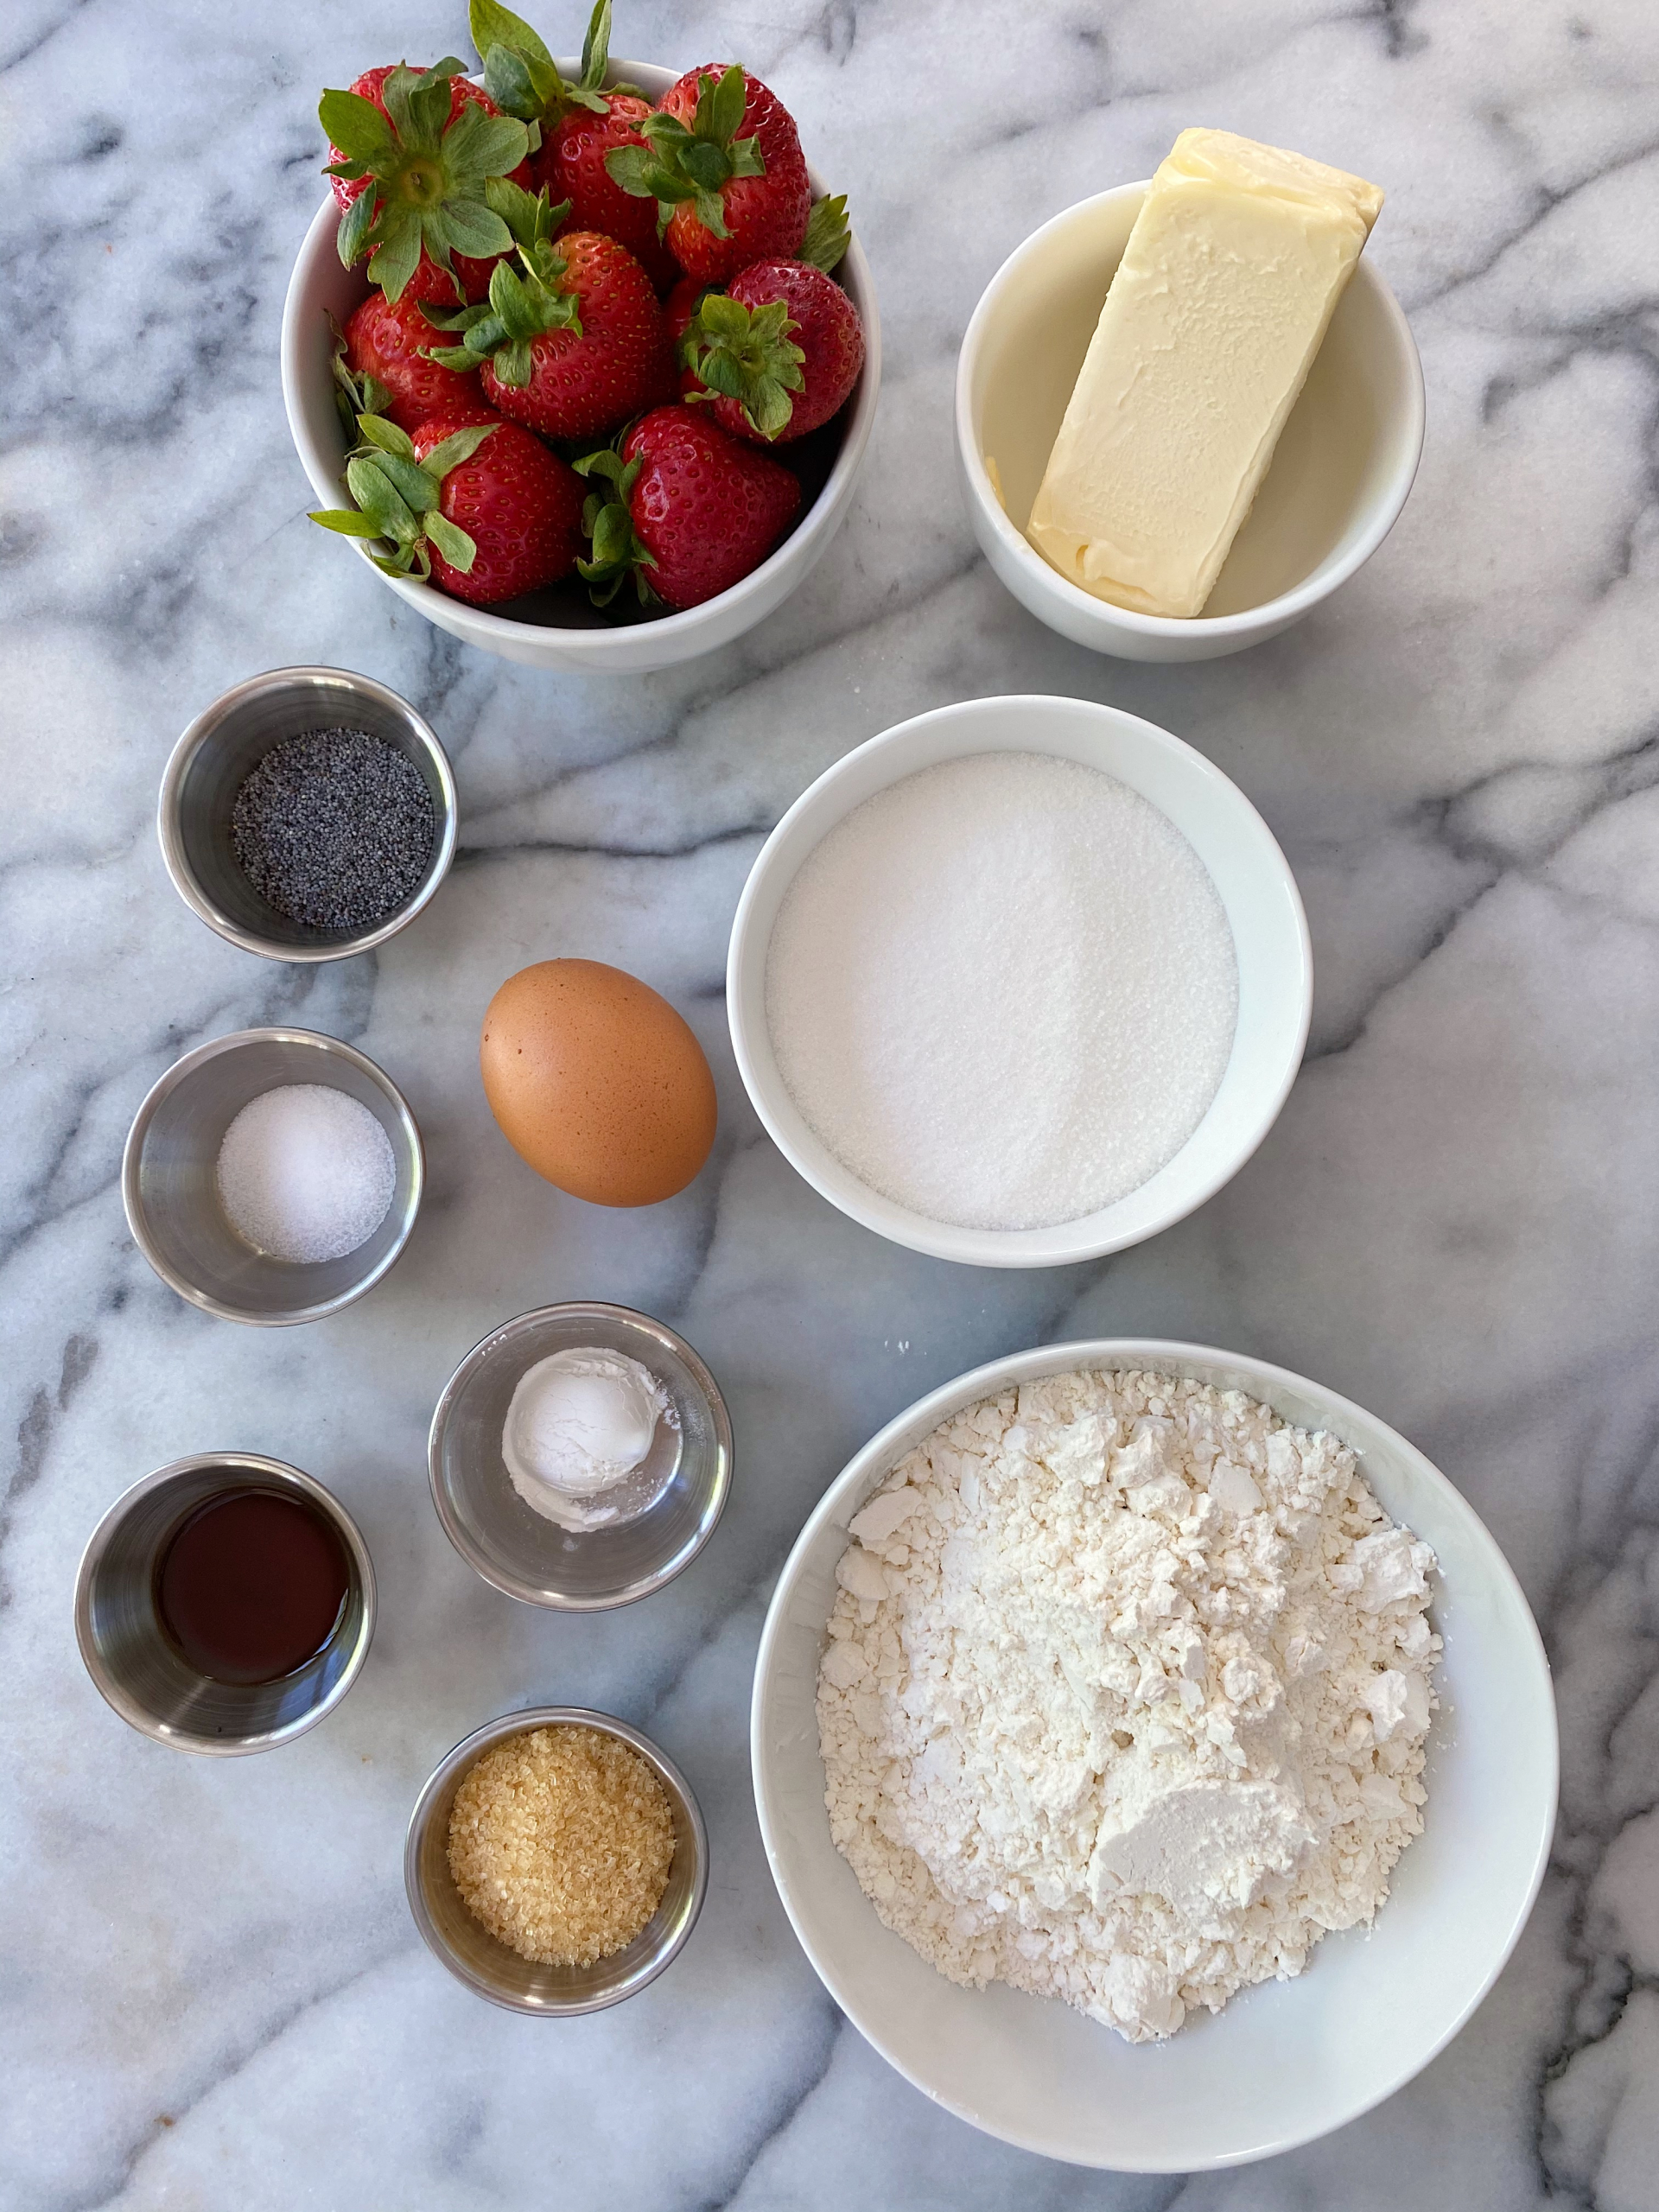 Strawberry Poppy Seed Cookies gluten free www.healthygffamily.com